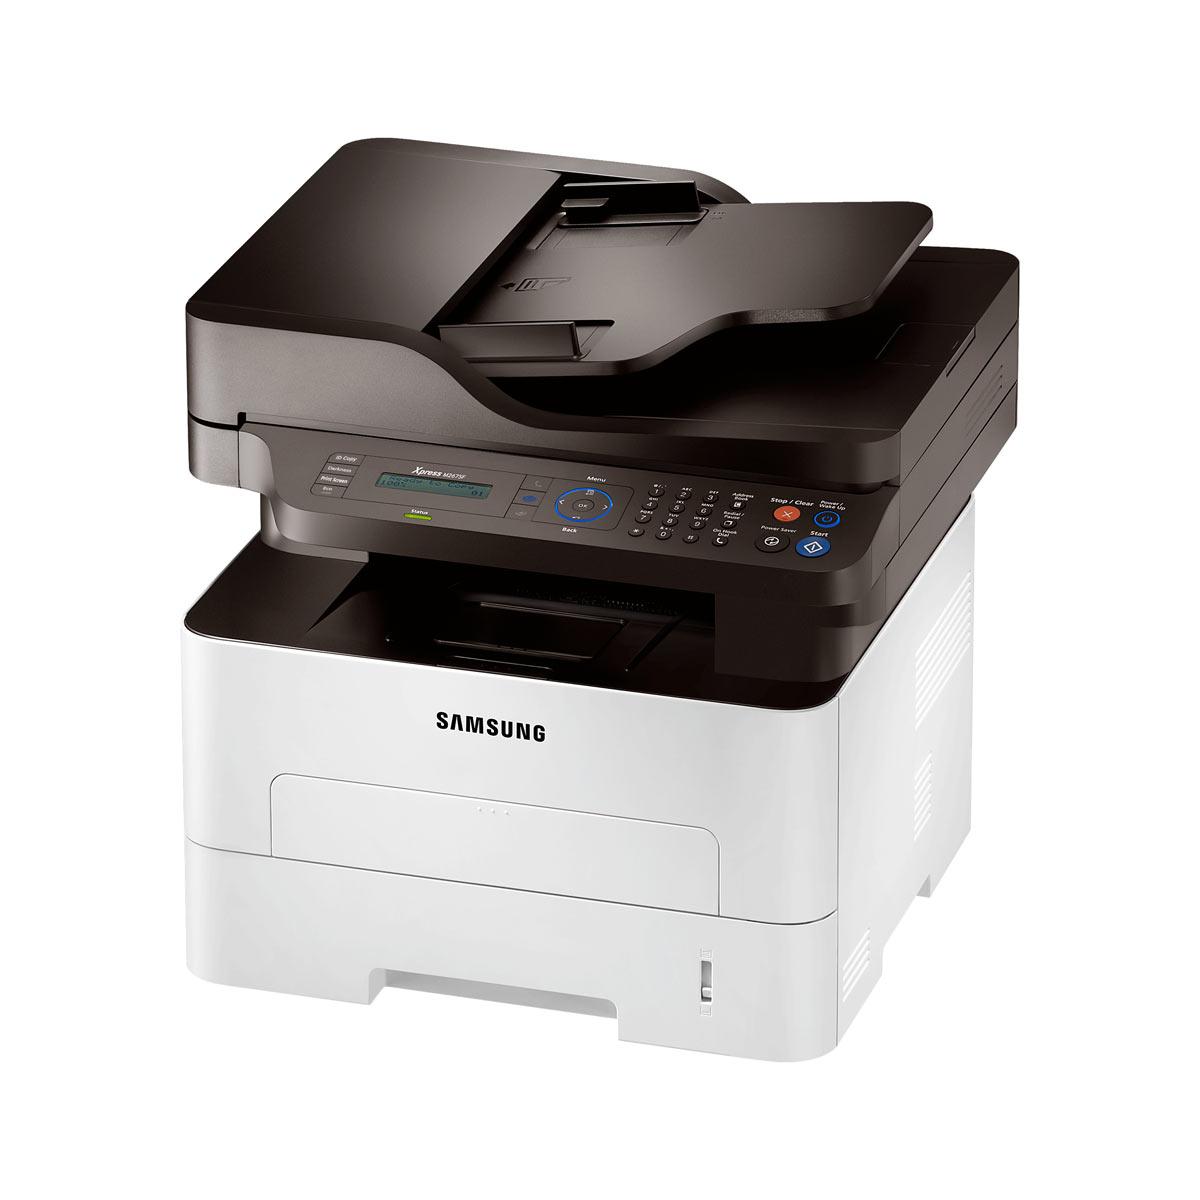 Imprimante multifonction Samsung SL-M2675FN - Cybertek.fr - 1